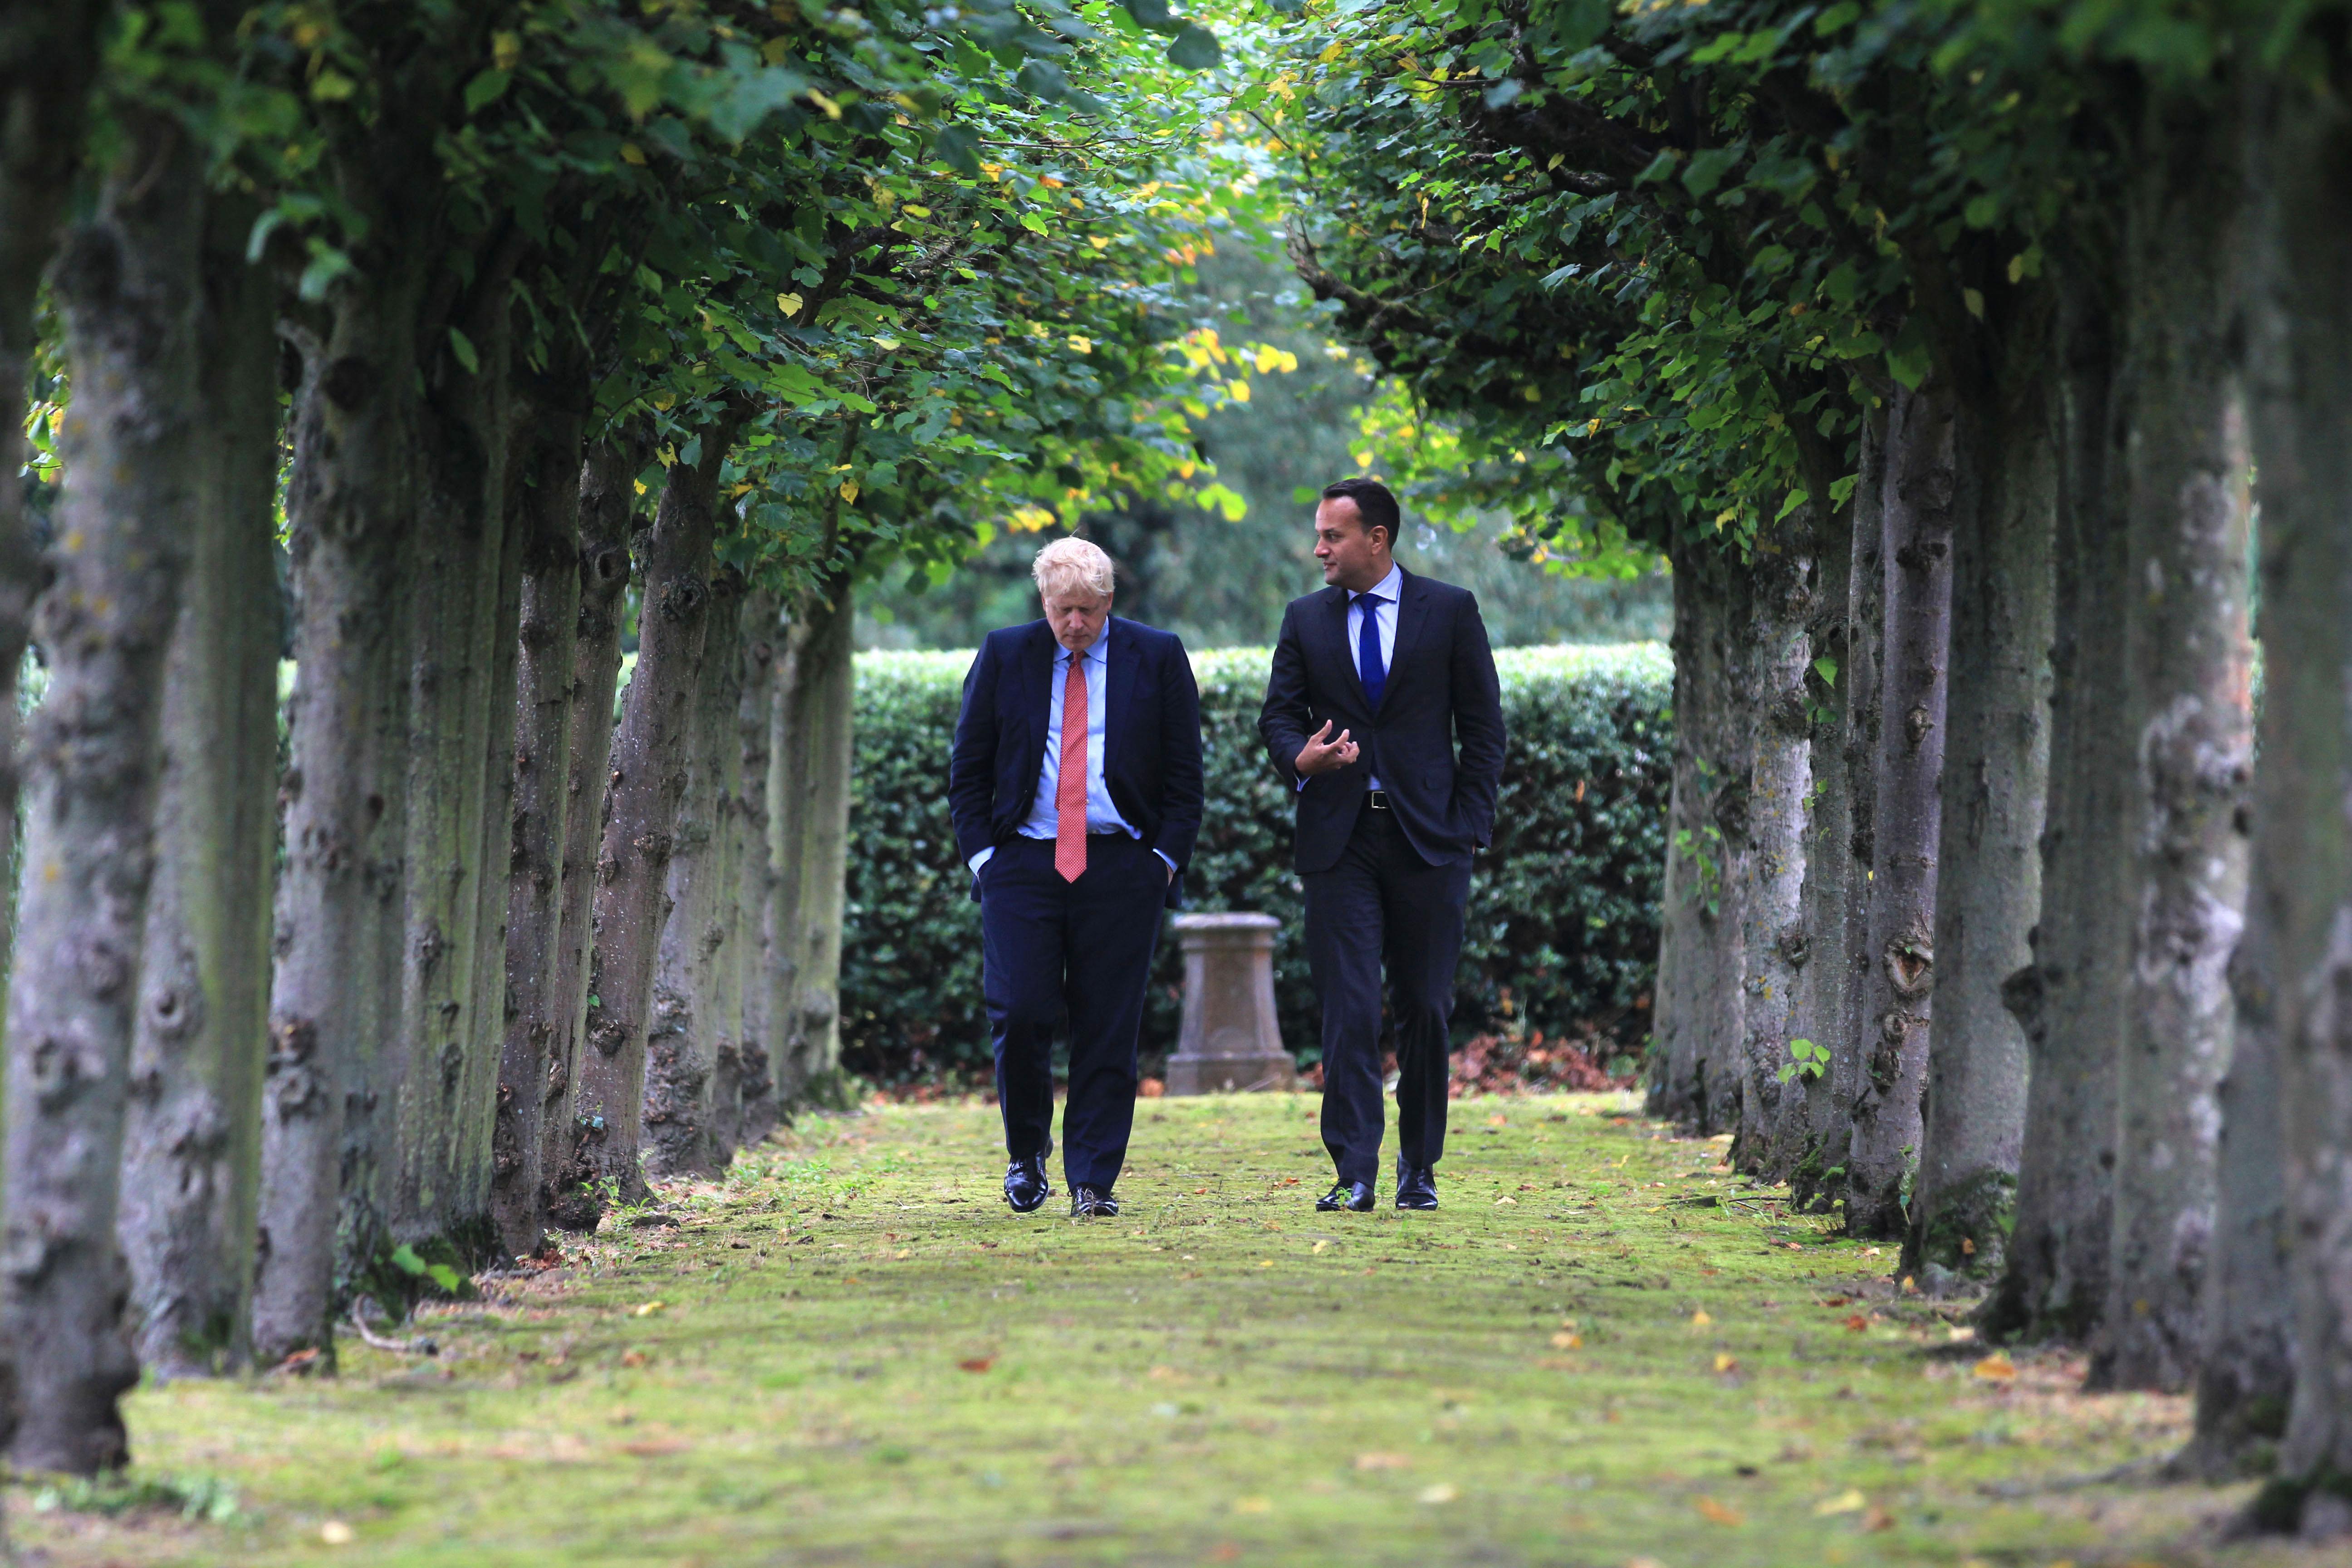 Varadkar's move towards Johnson in recent weeks spooks EU officials